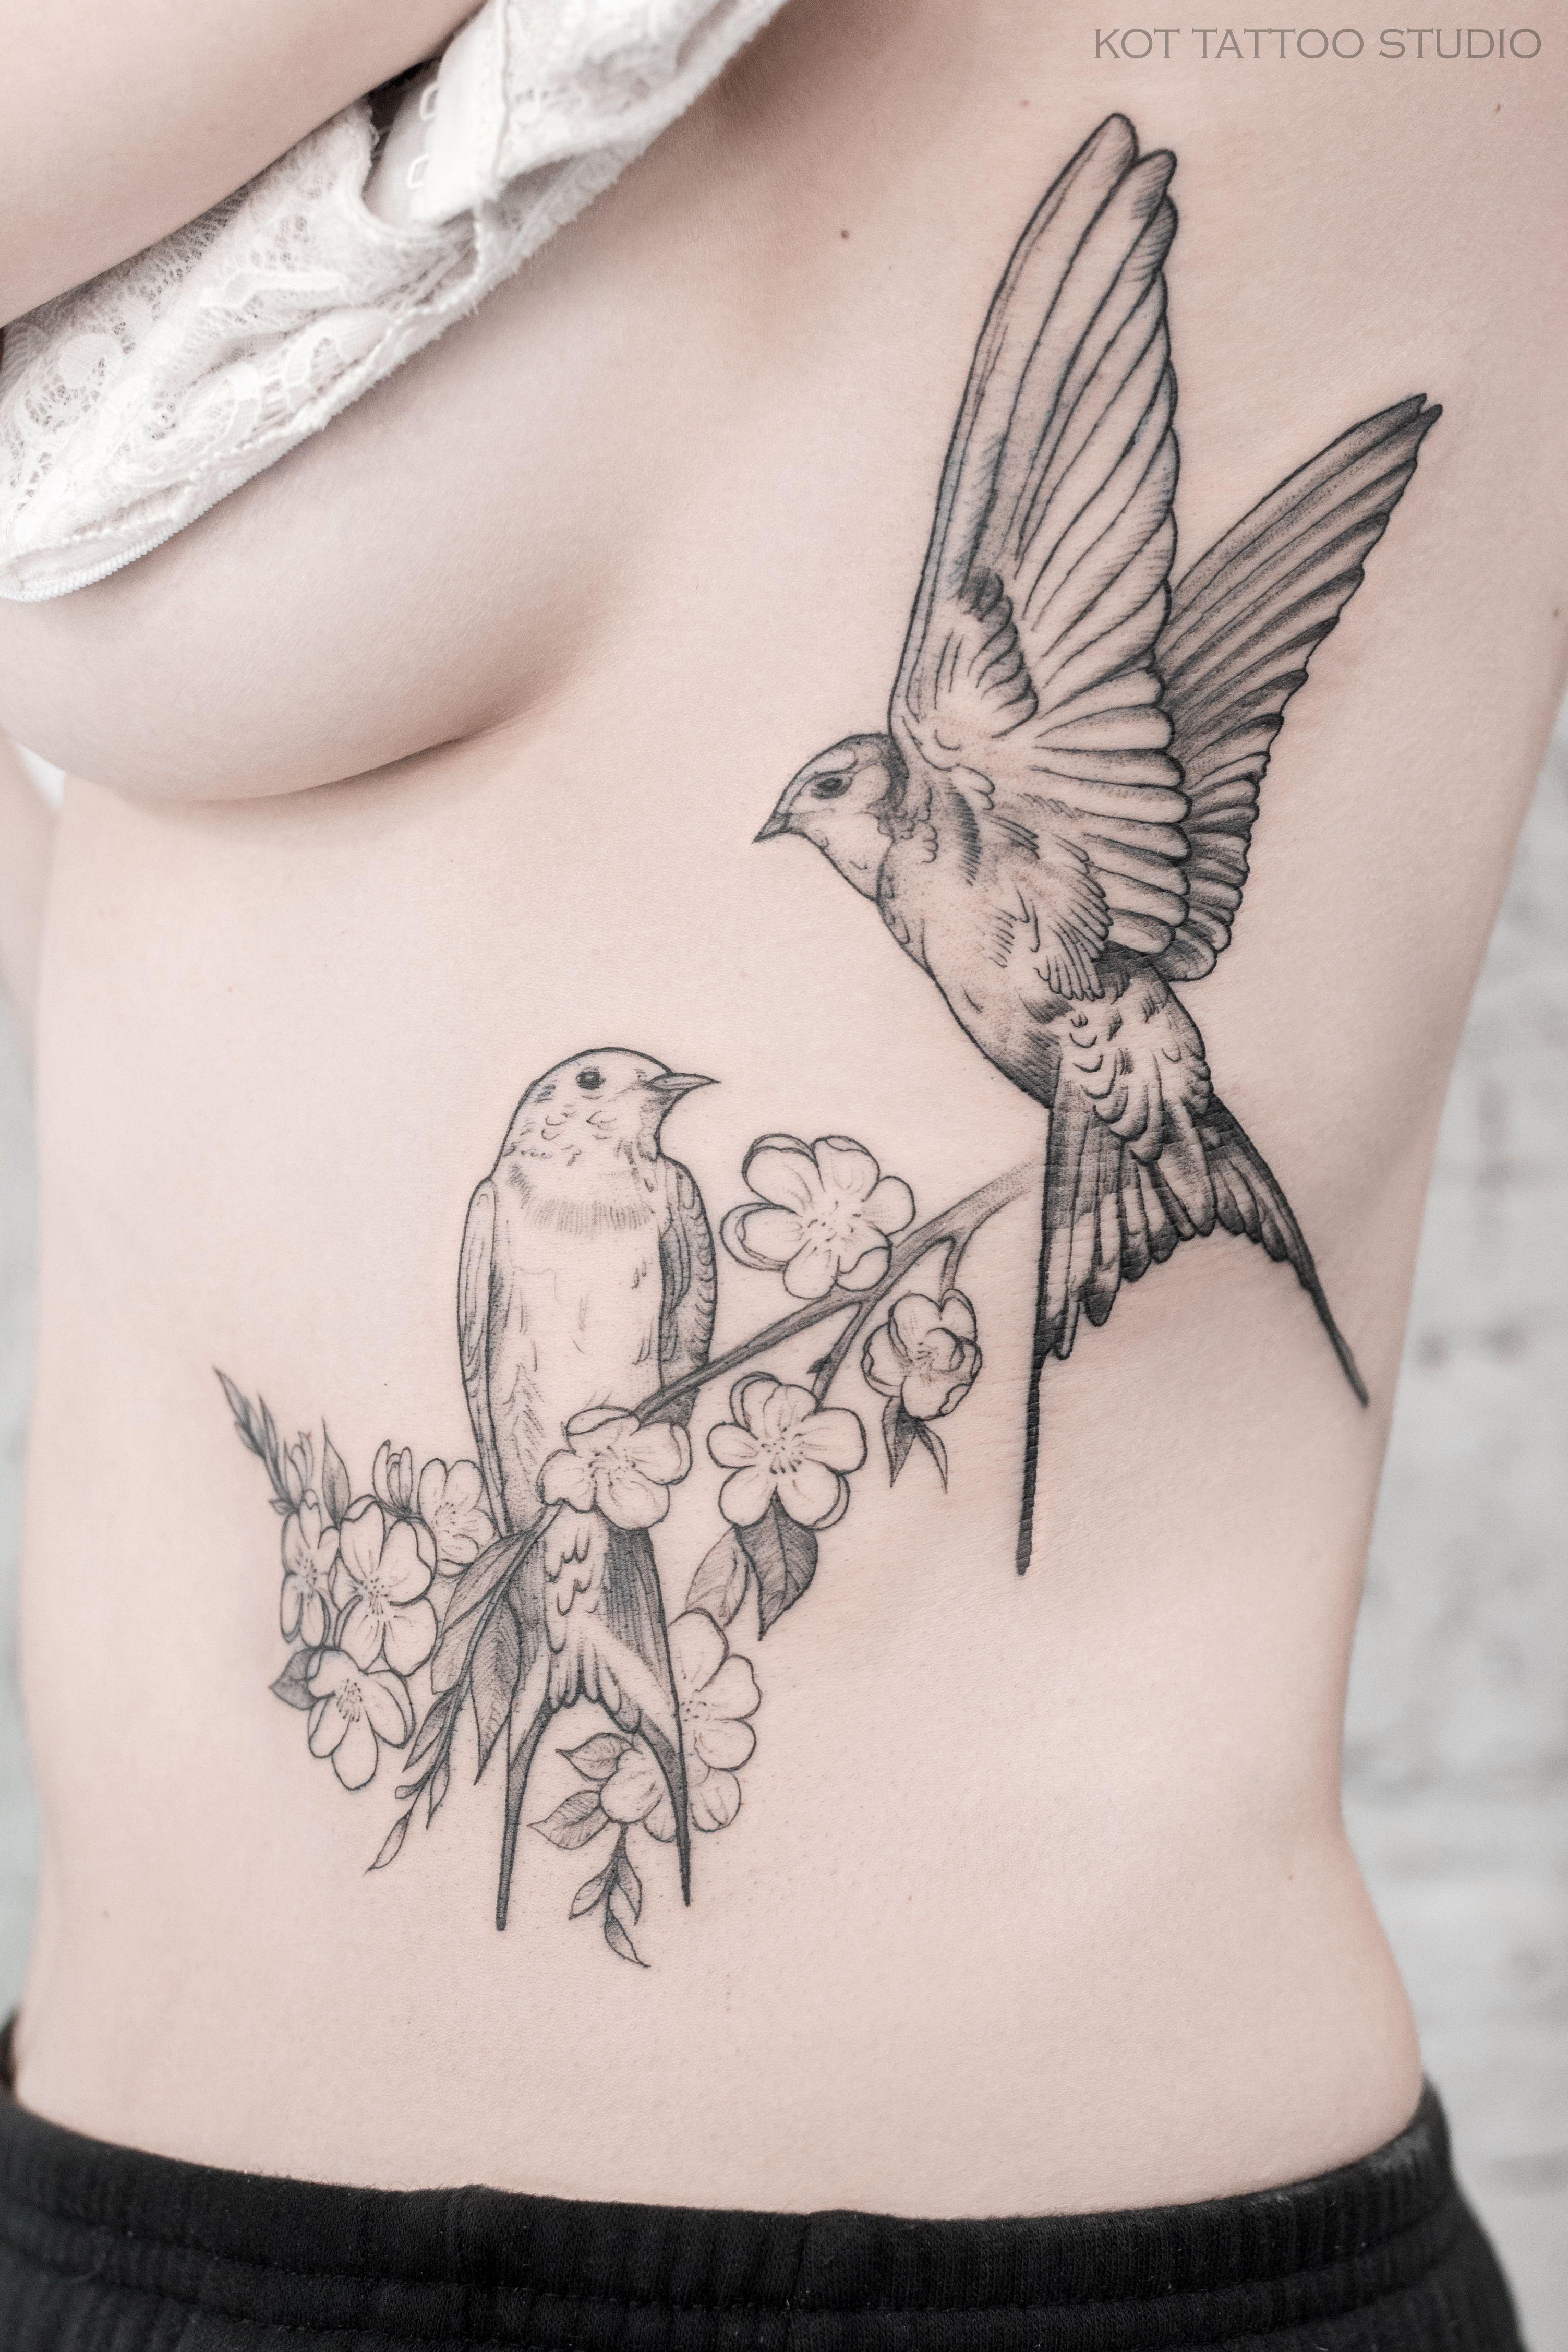 тату ласточка популярно всегда это тату ласточка для девушек